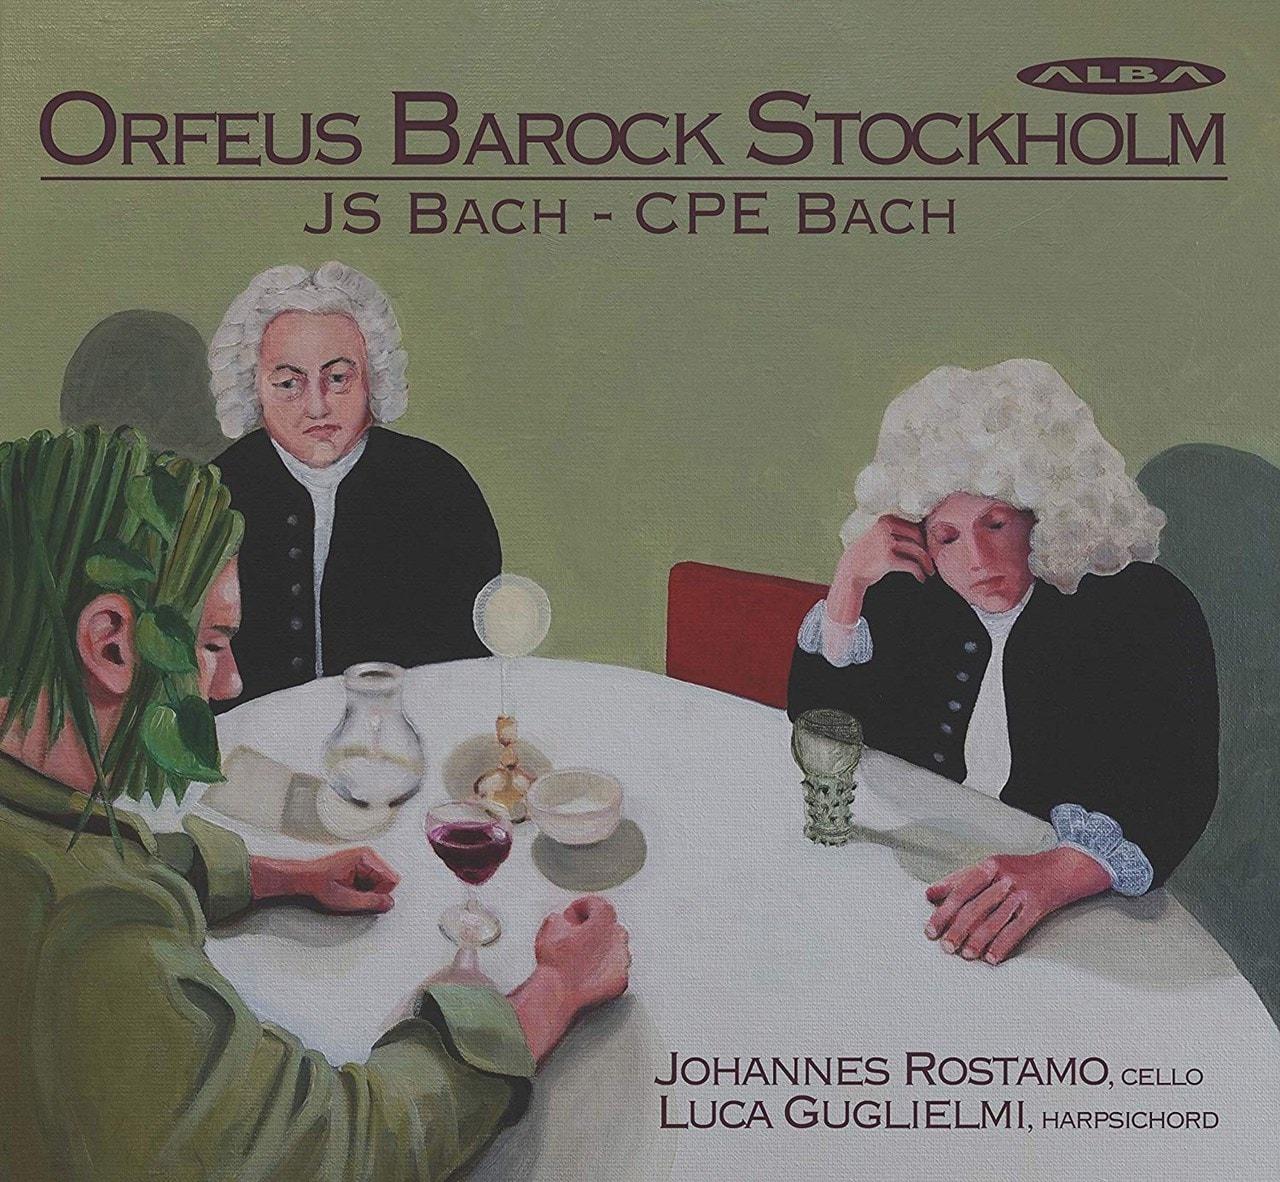 J.S. Bach/ C.P.E. Bach: Orfeus Barock Stockholm - 1